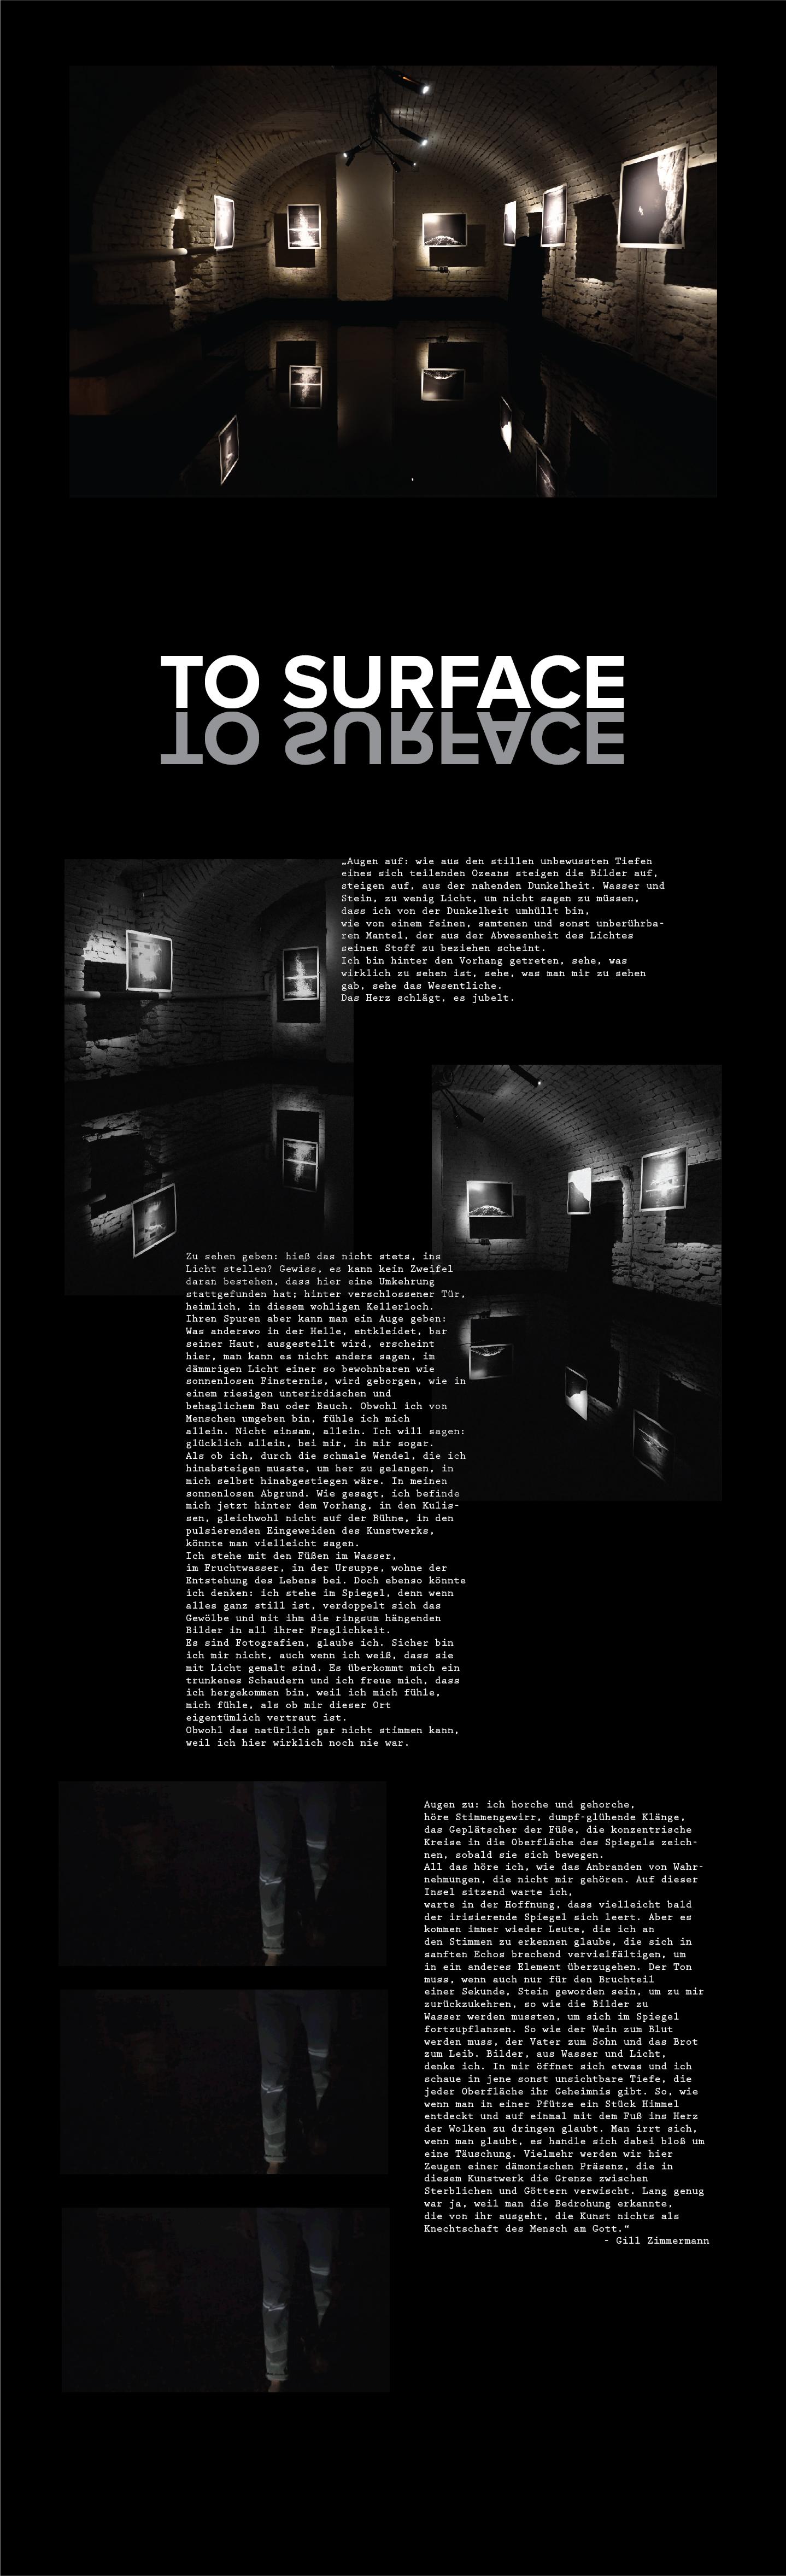 tosurface-01.jpg